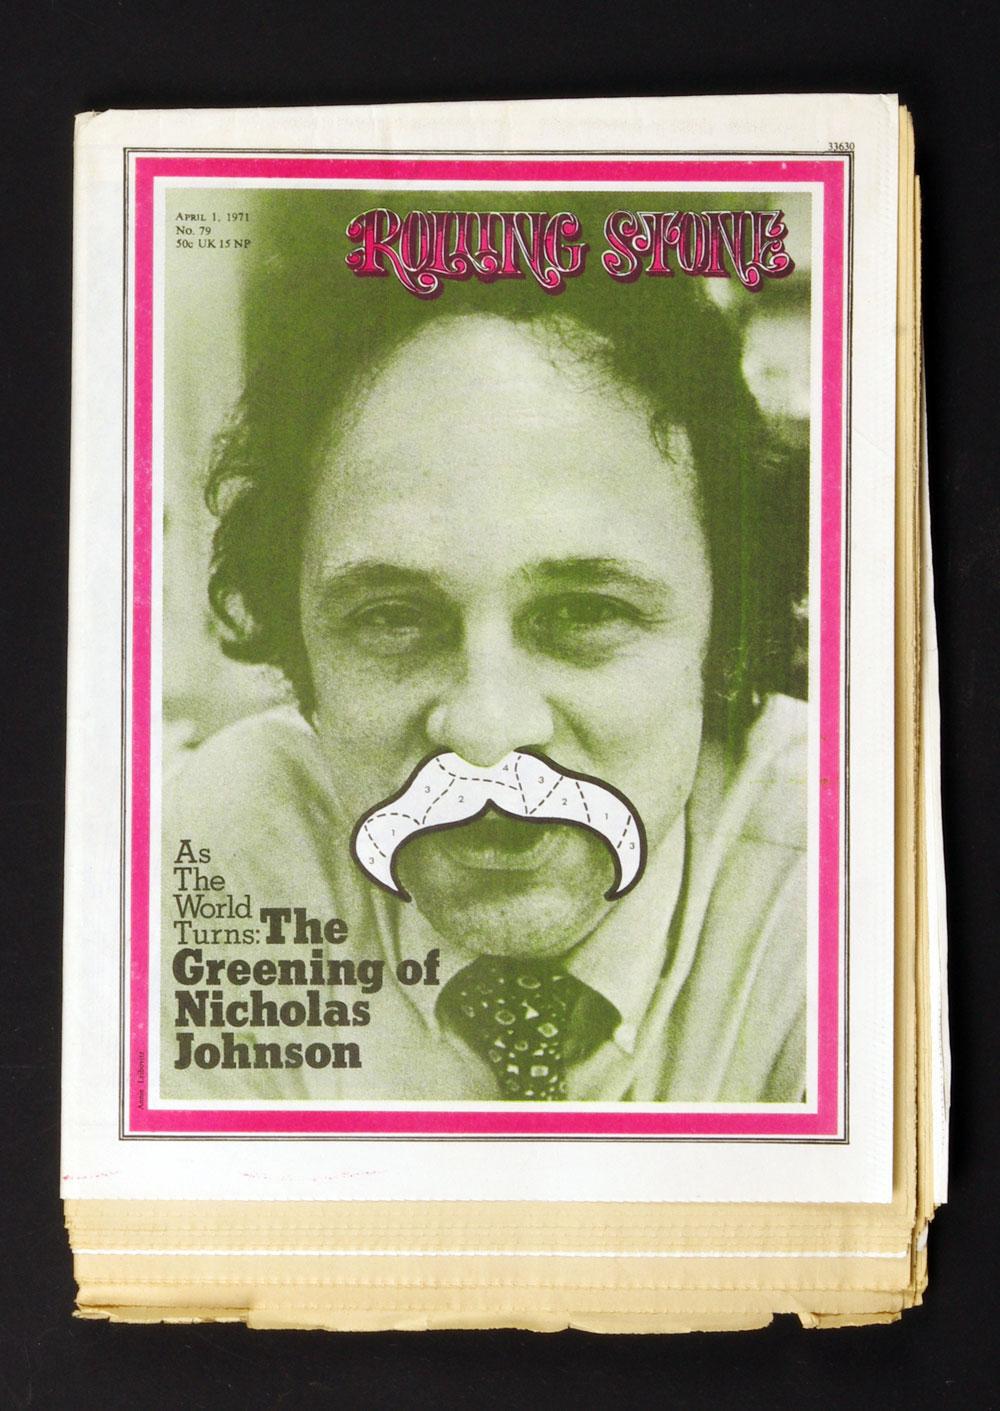 Rolling Stone Magazine 1971 Apr 1 No. 79 Nicolas Johnson